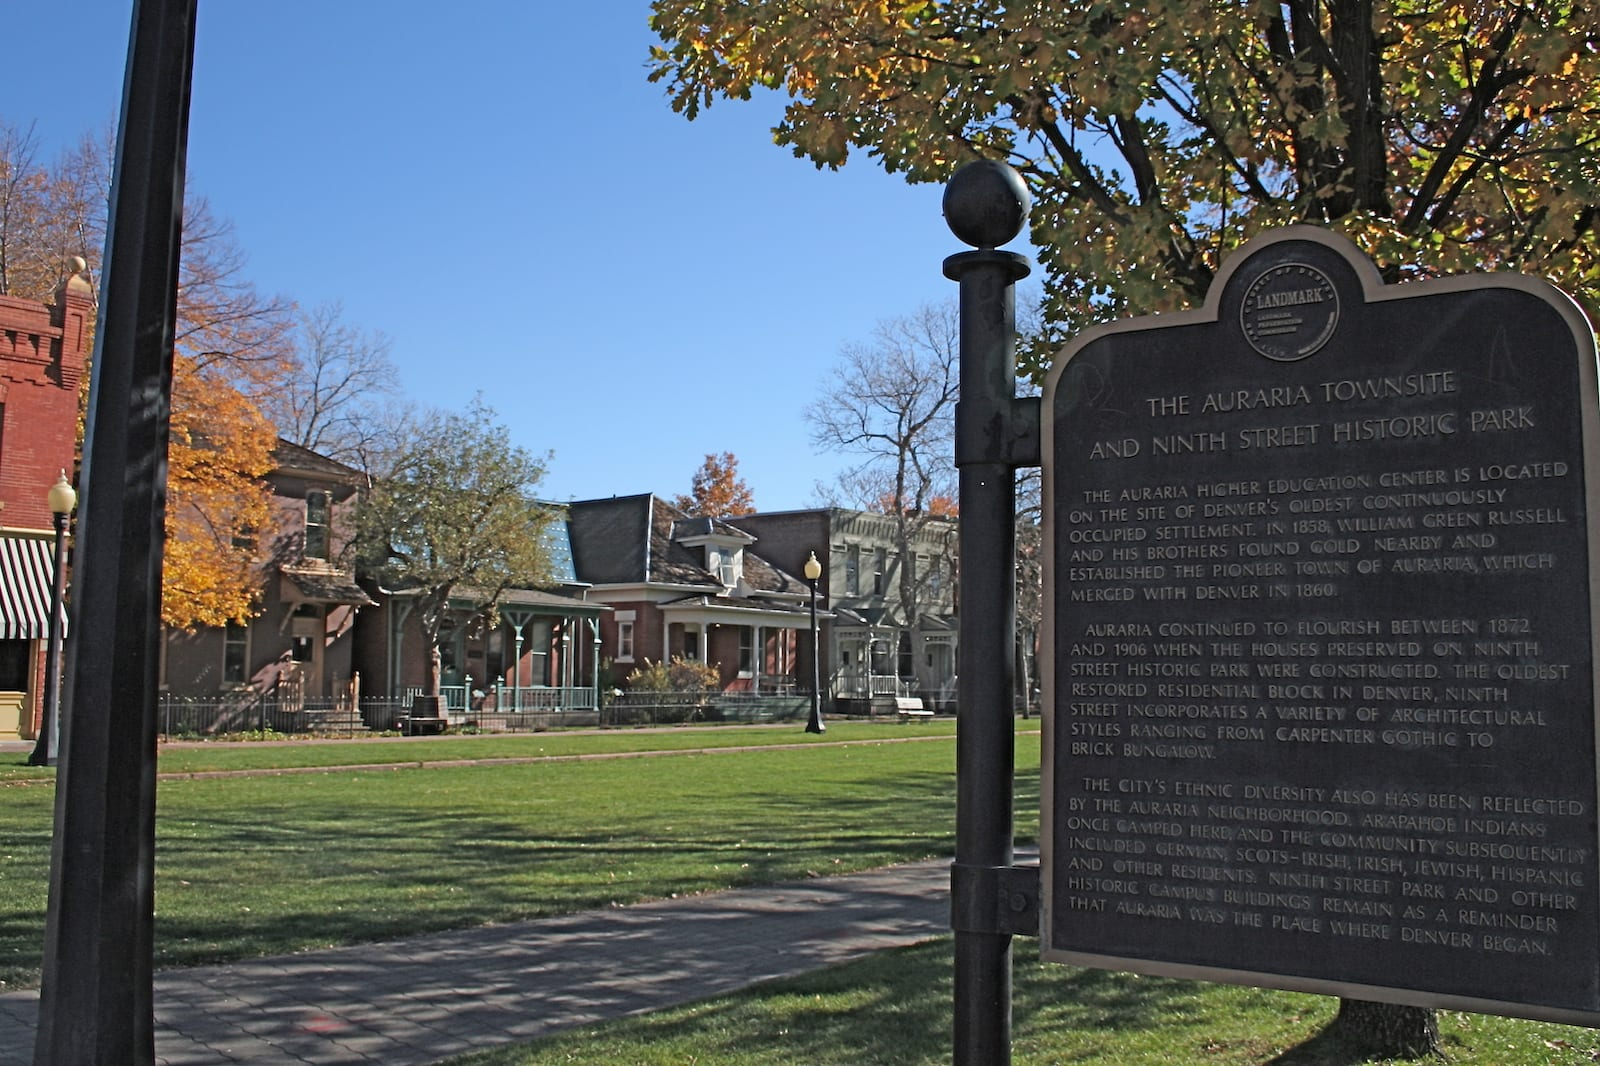 Auraria CO Ninth Street Historic Park Sign